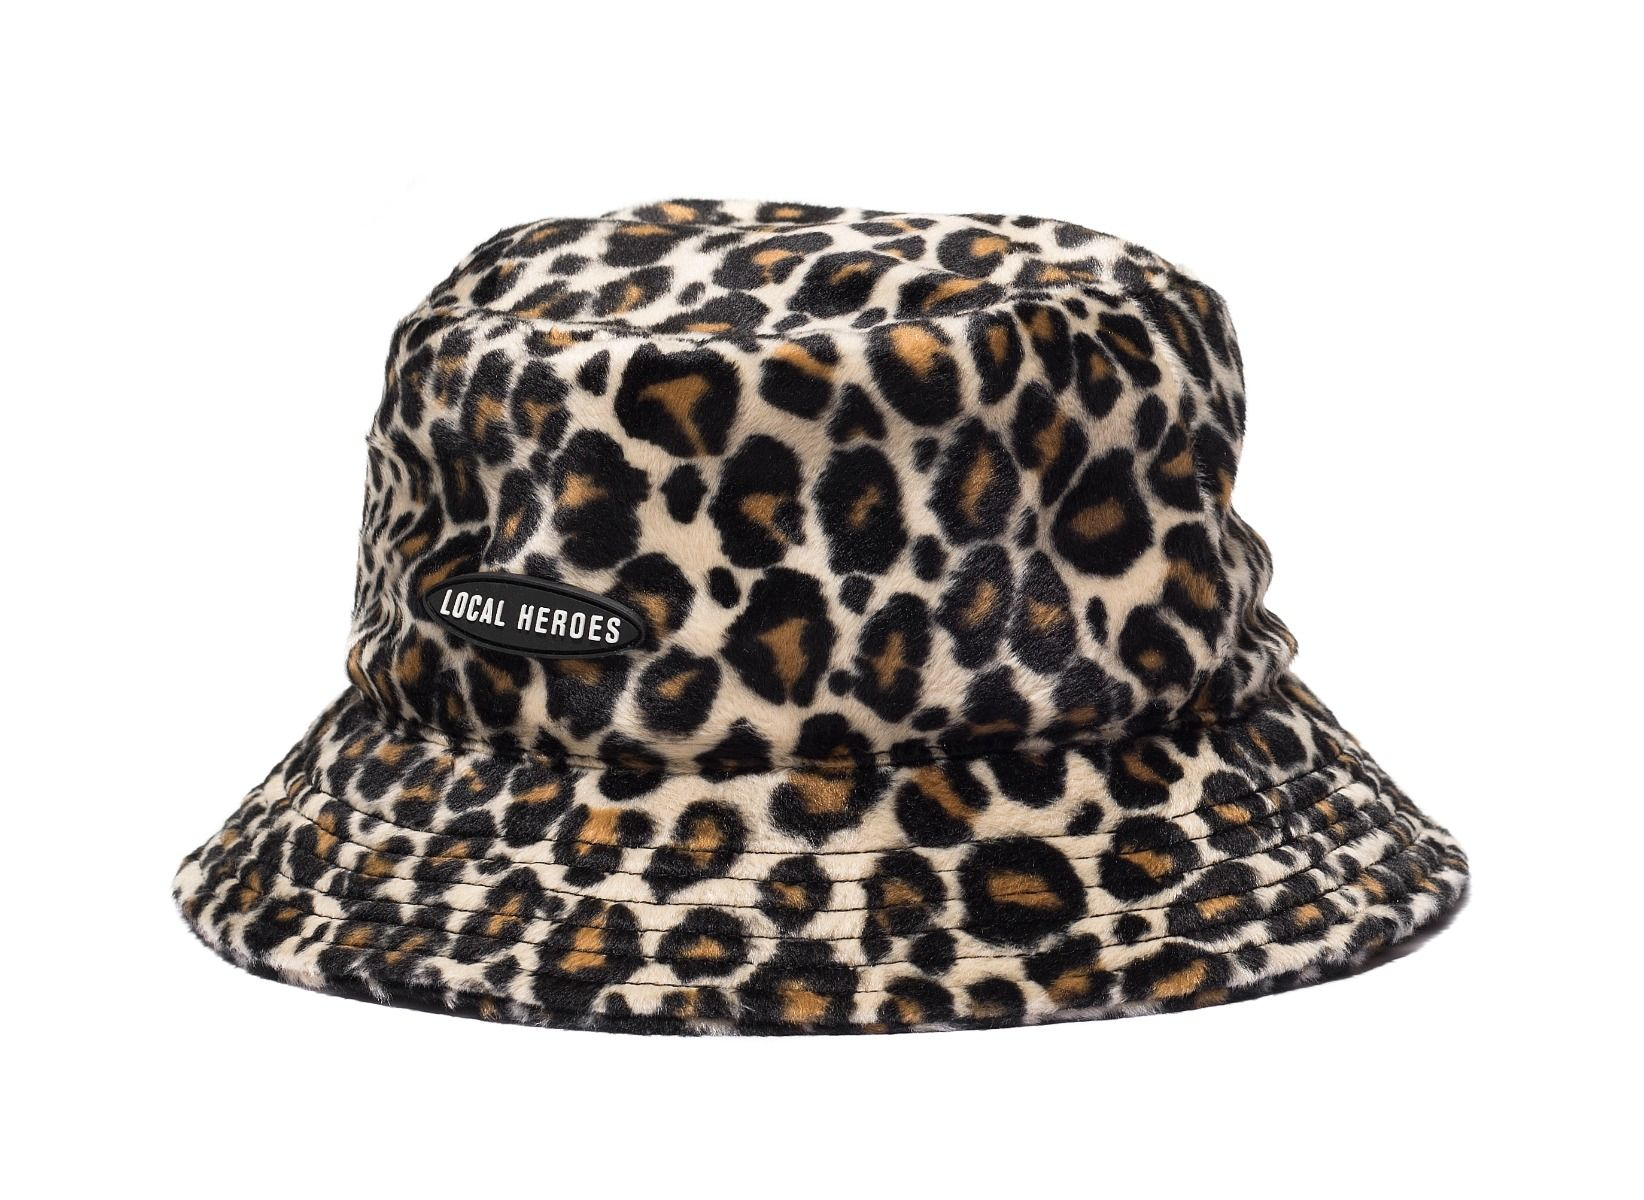 Lh Leopard Bucket Hat Fashion Cap Bucket Hat Hats